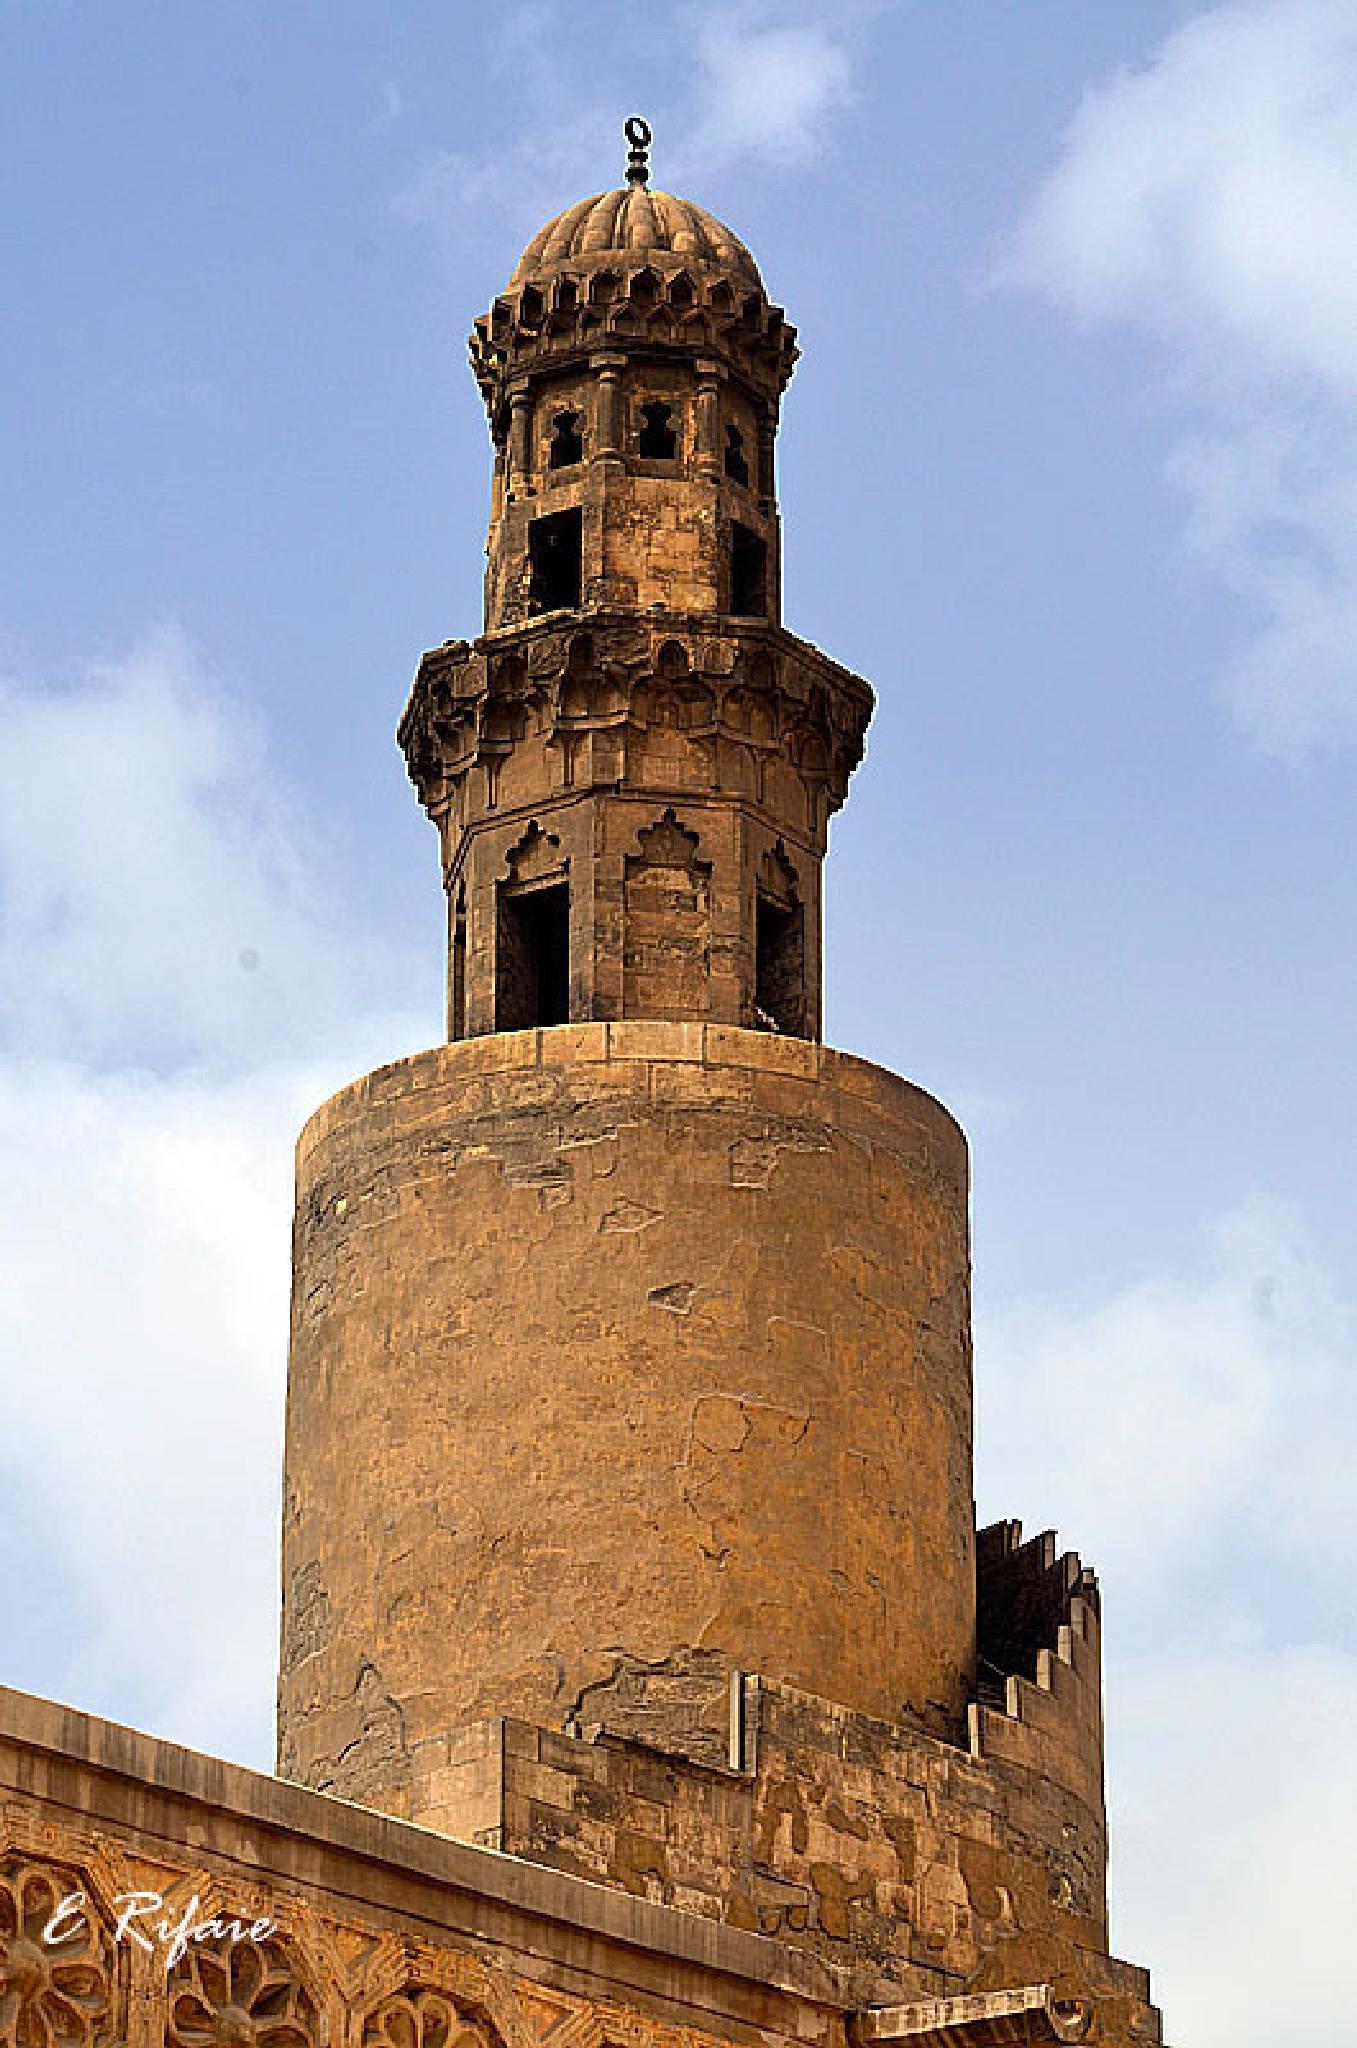 Ebn Tulun mosque by Emad Eldin Moustafa El Refaie